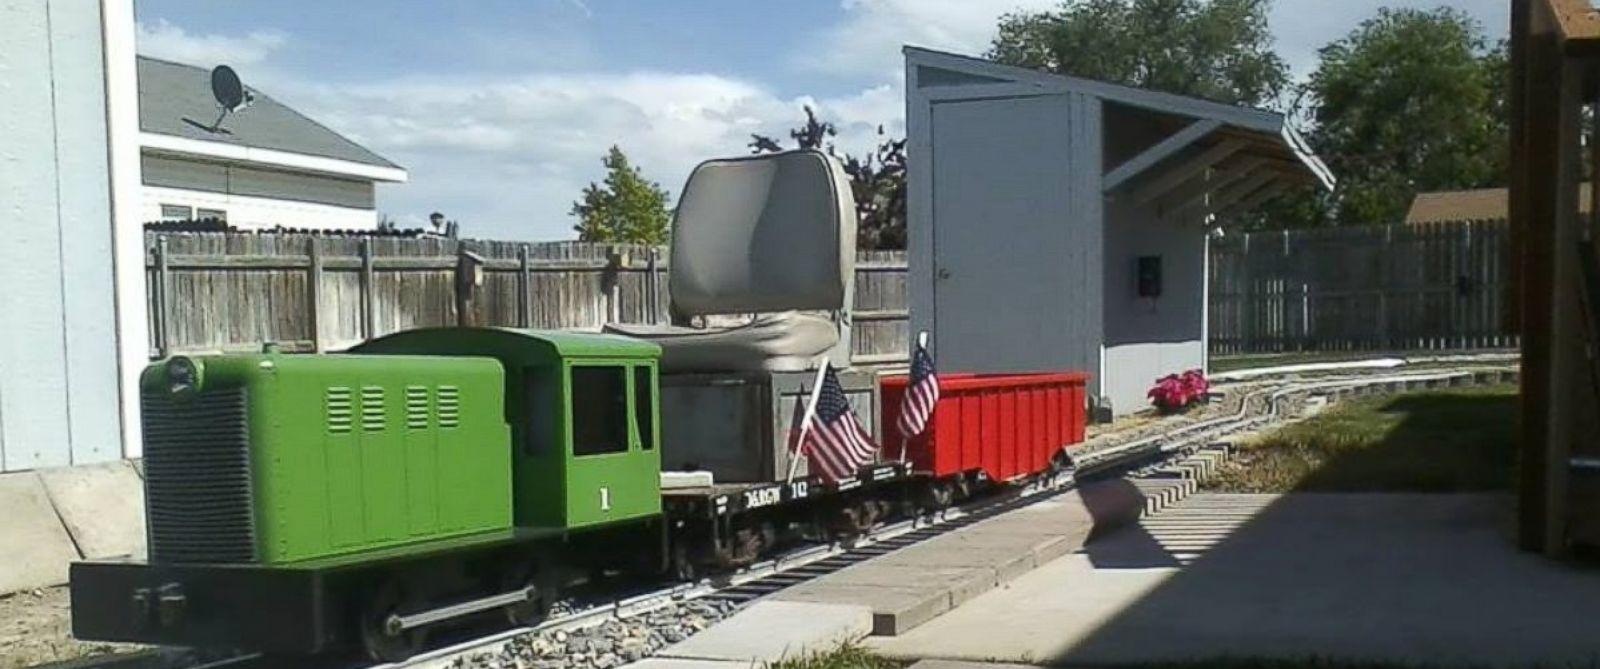 man builds 400 foot railroad in backyard because he 39 got a